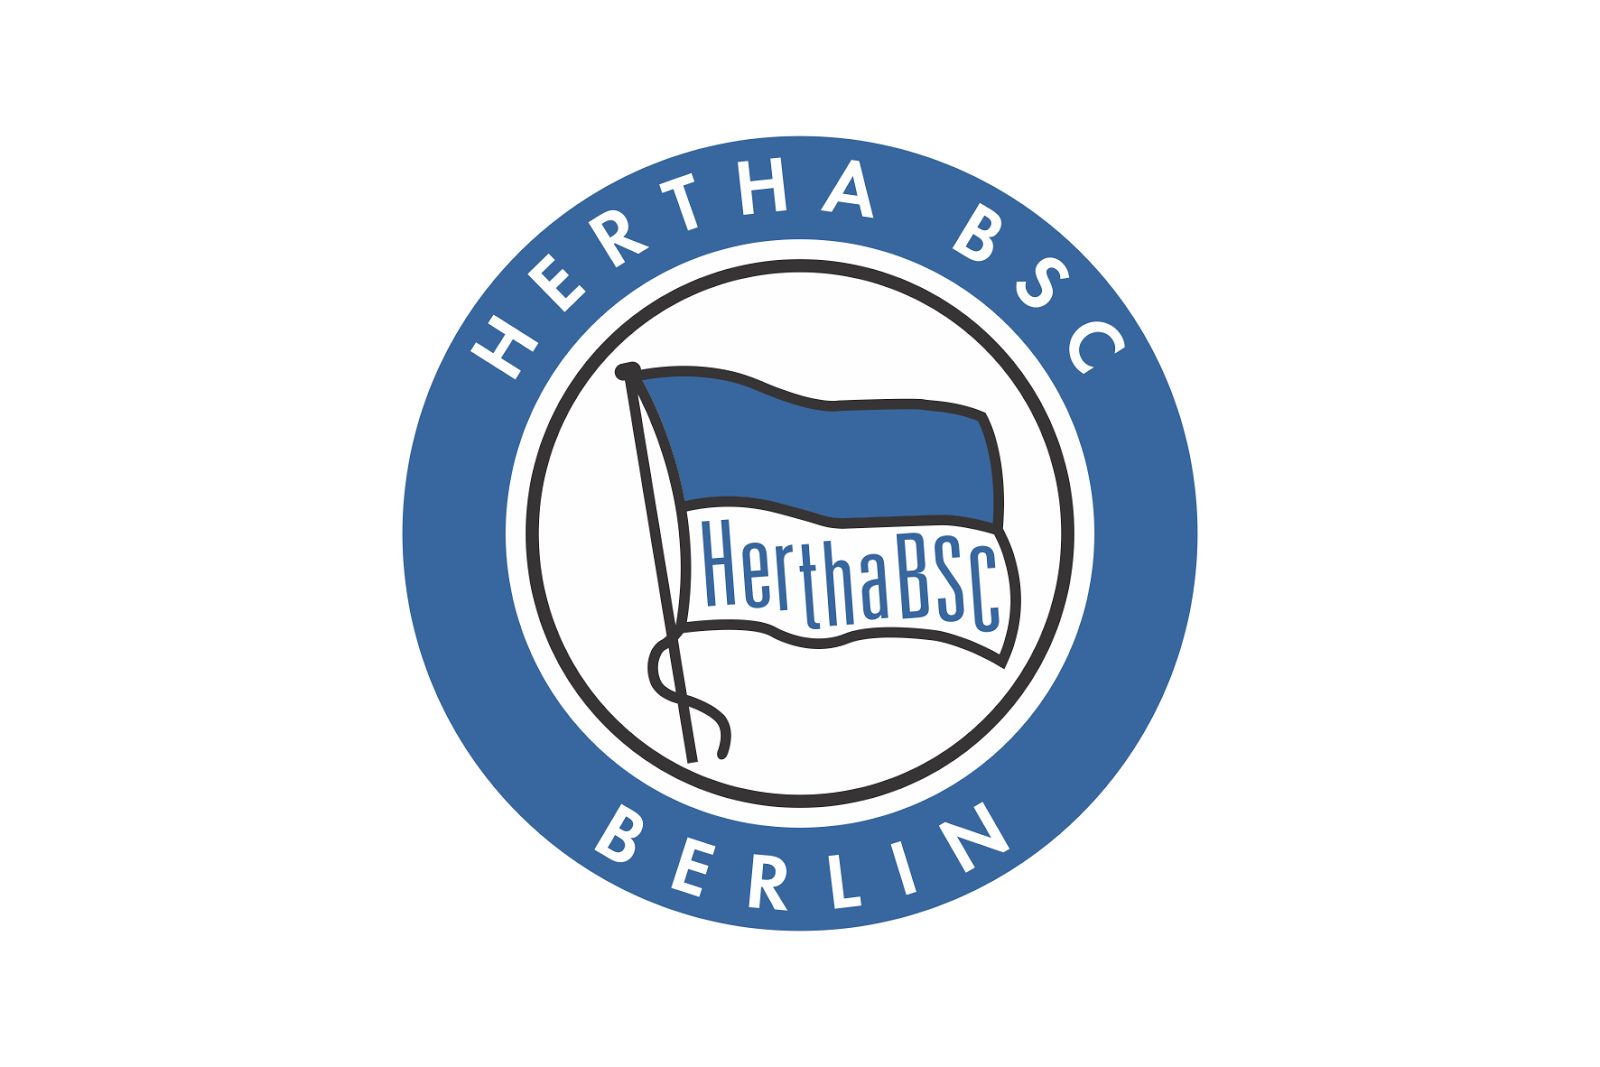 logo hertha